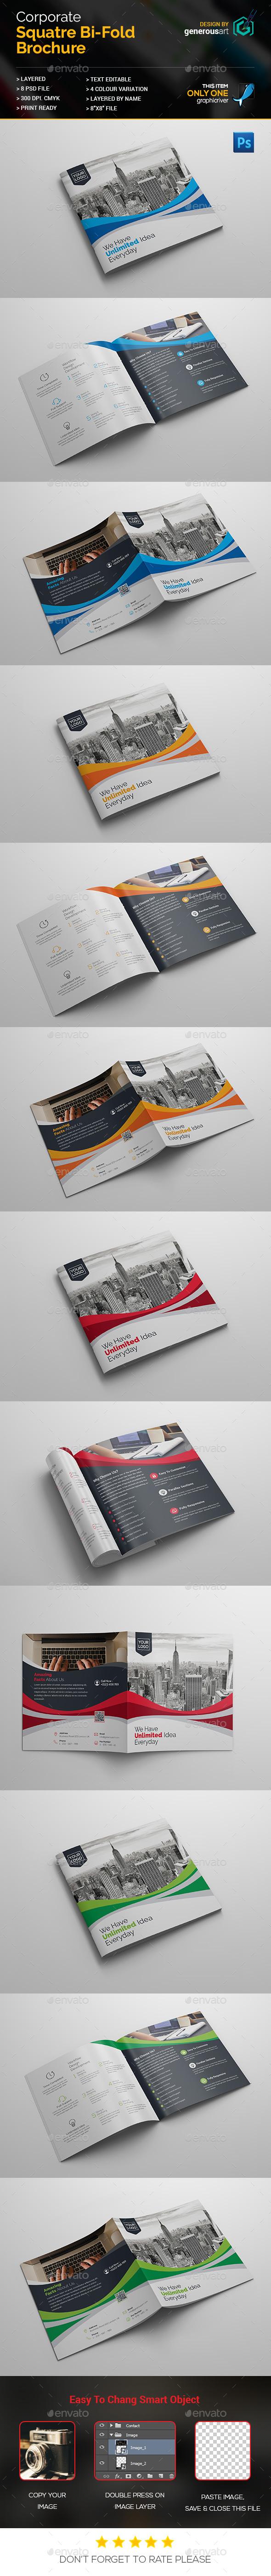 Square Bi-Fold Brochure Design - Corporate Brochures